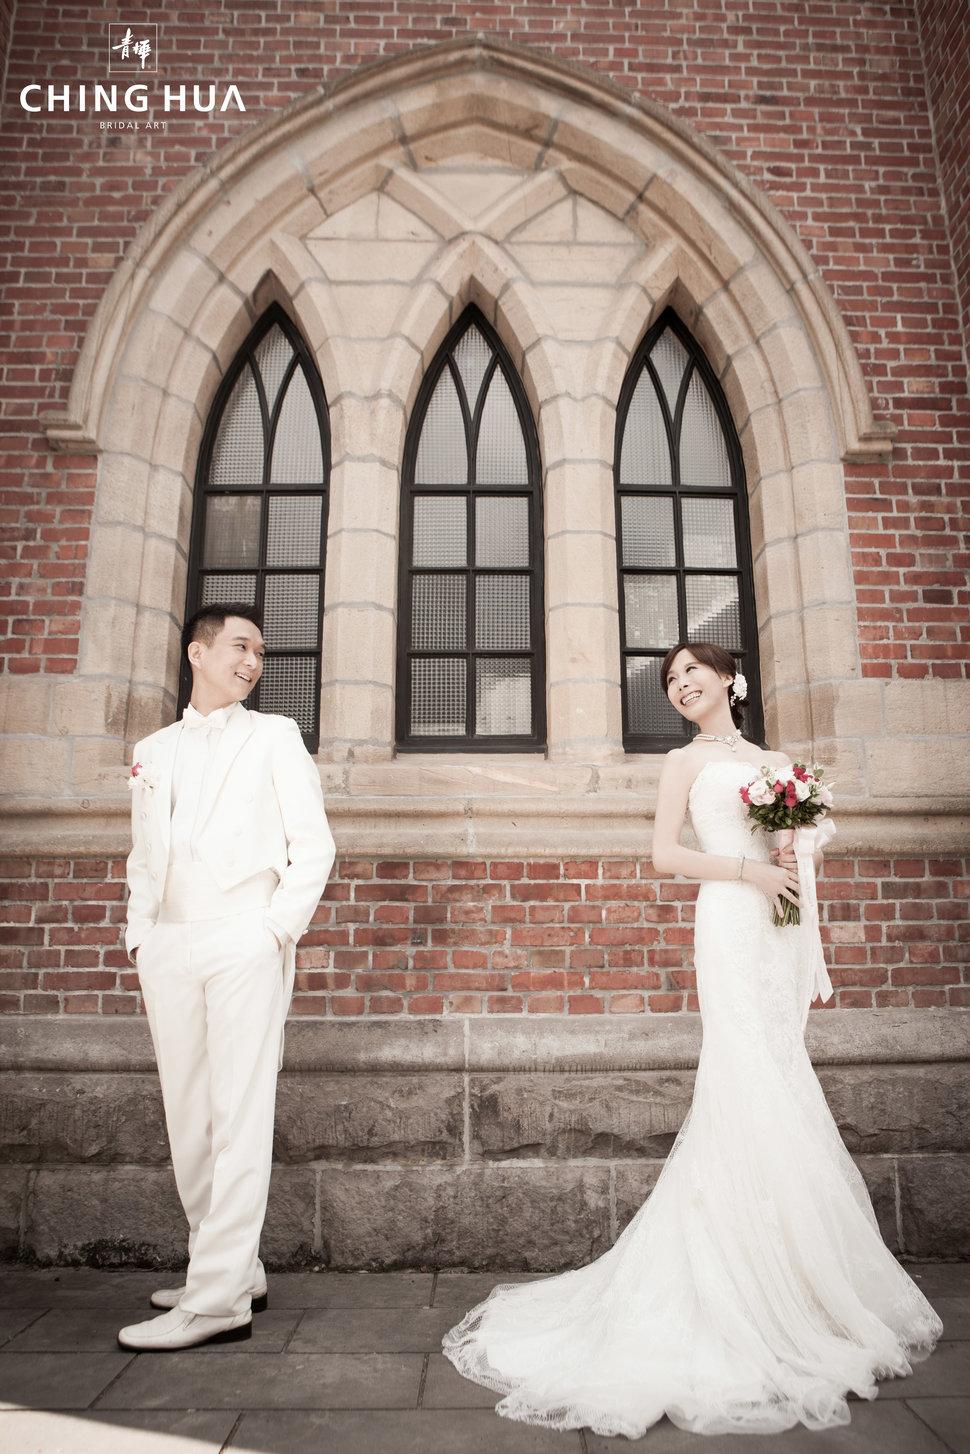 (編號:397195) - 青樺婚紗CHINGHUA - 結婚吧